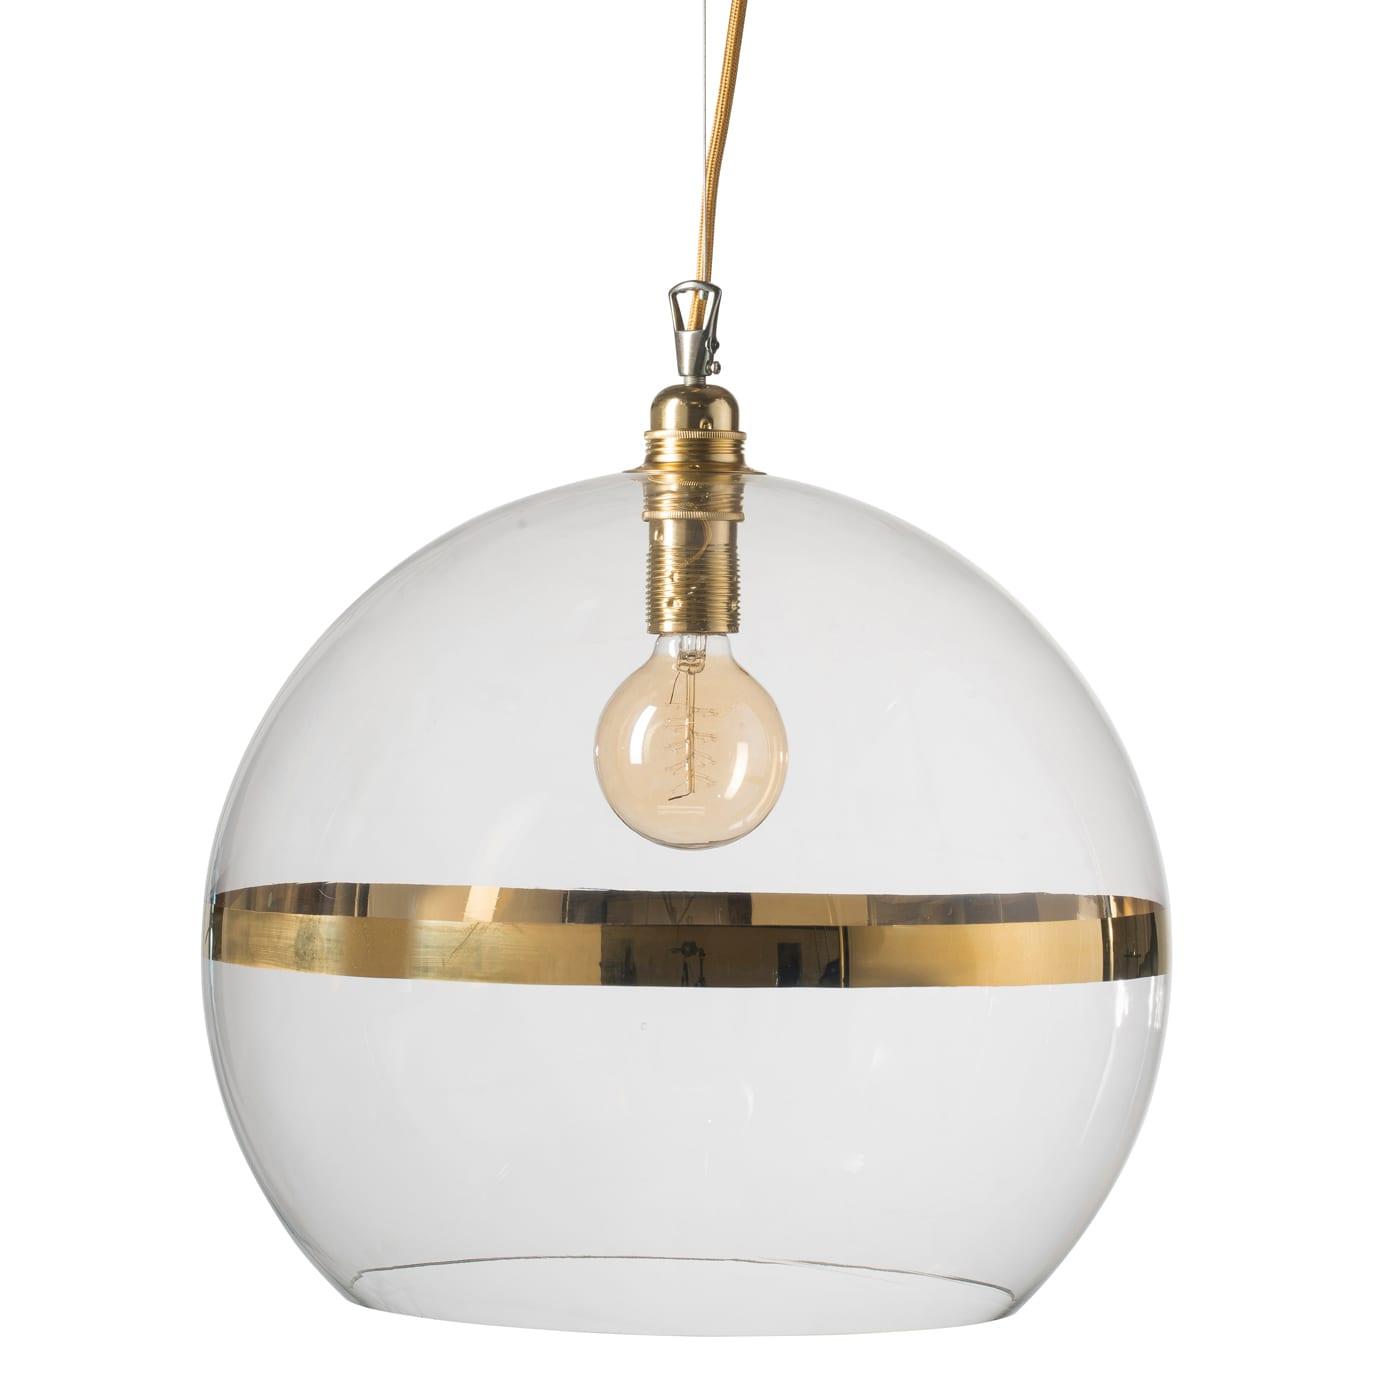 Rowan pendant lamp, gold stripe on clear, 39cm